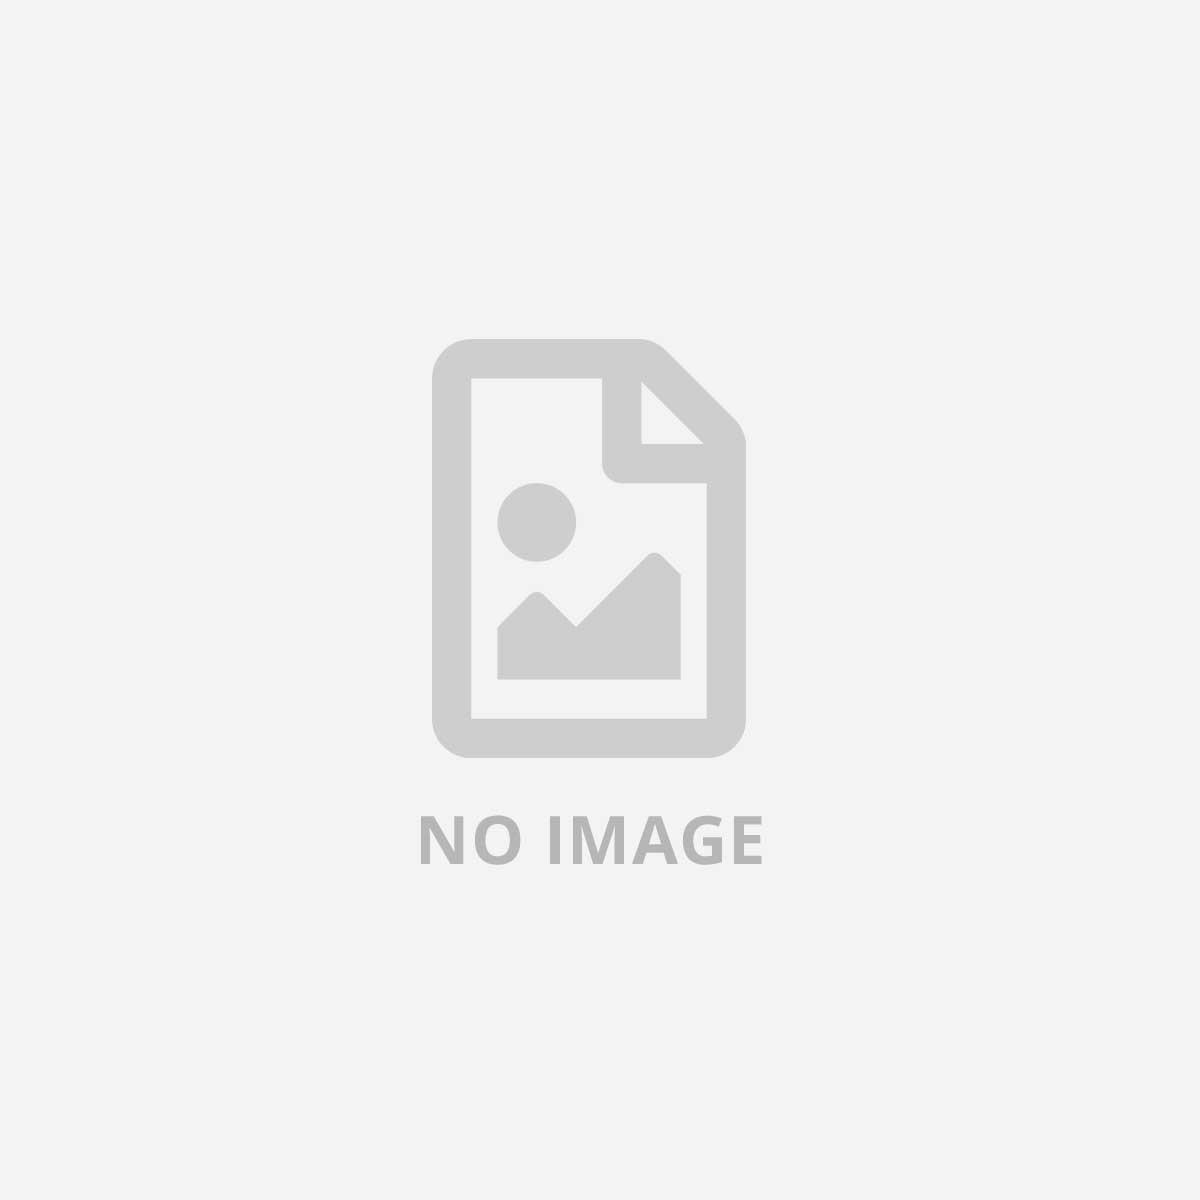 FUJIFILM LTO ULTRIUM G4 WORM 800-1600GB